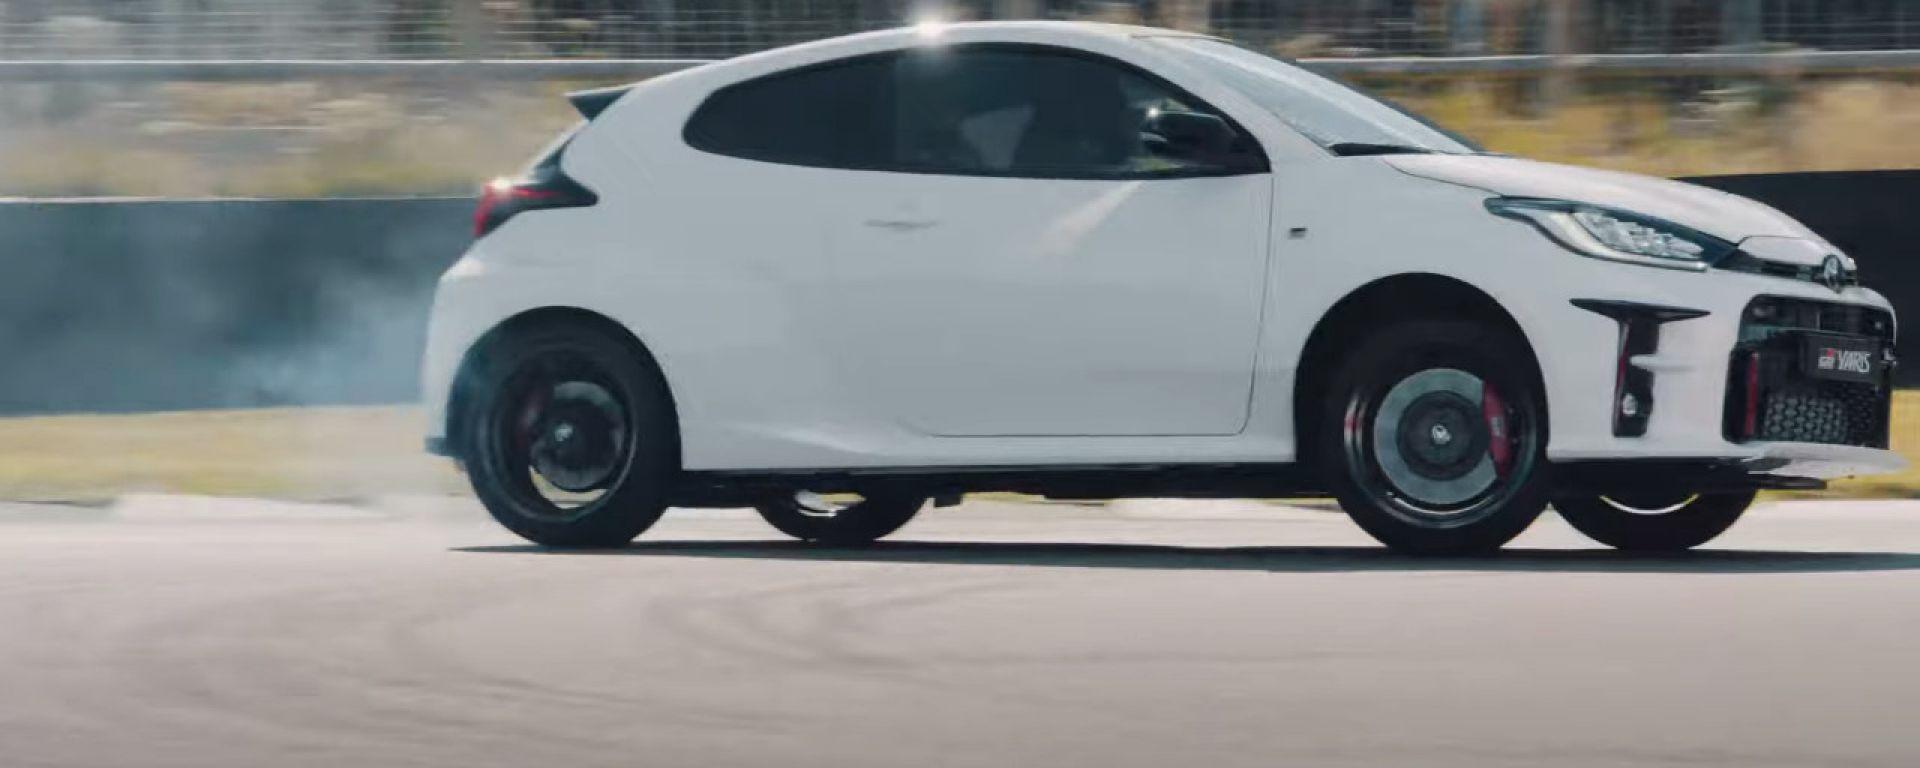 Toyota GR Yaris: piccola bomba all'opera nel video